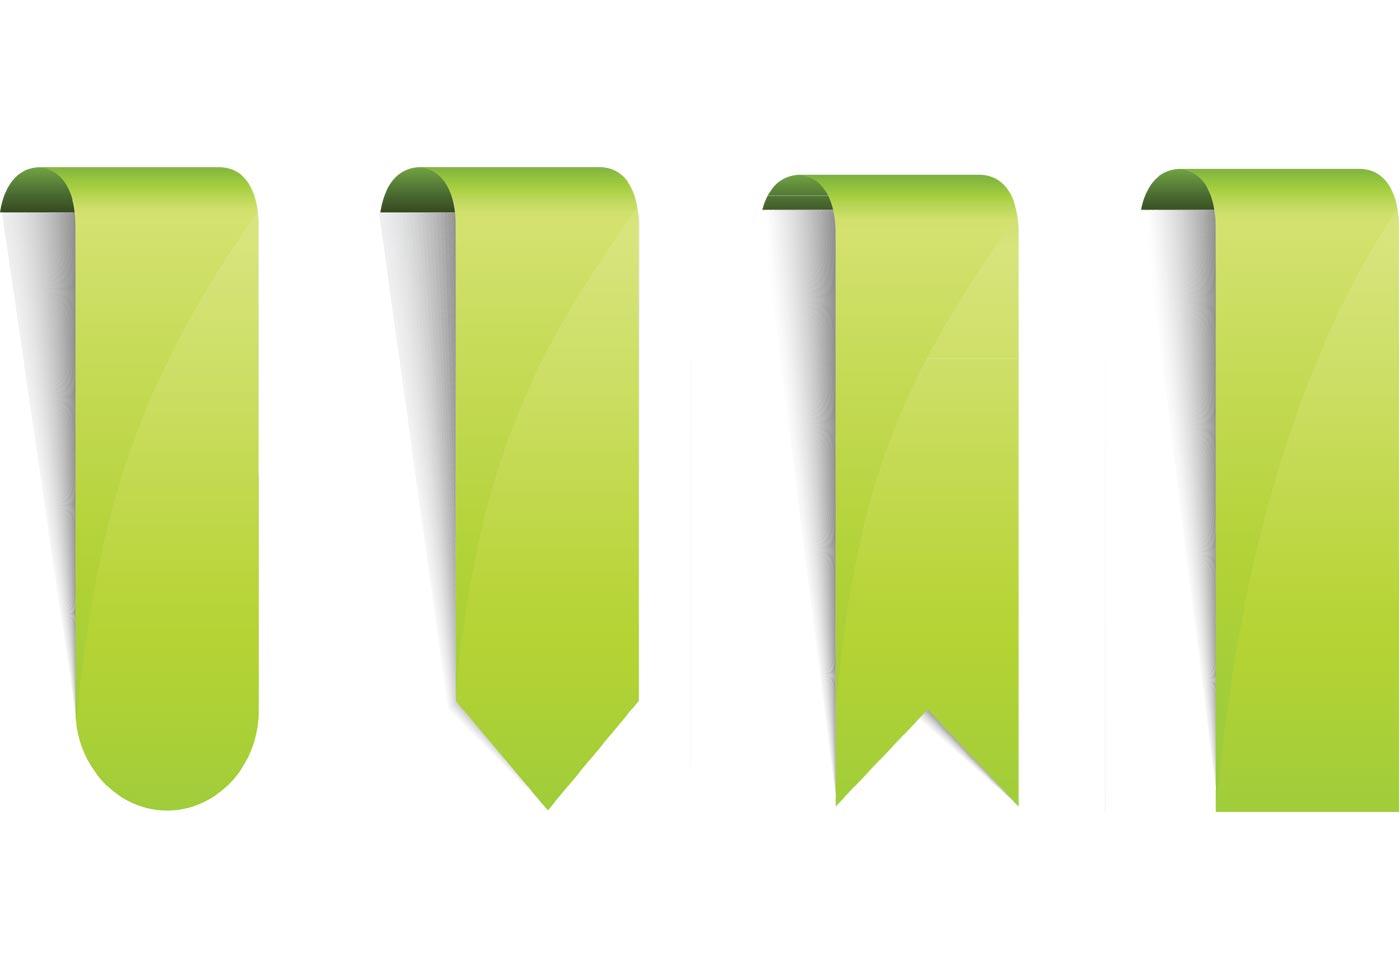 Vertical Ribbons Label Design Royalty Free